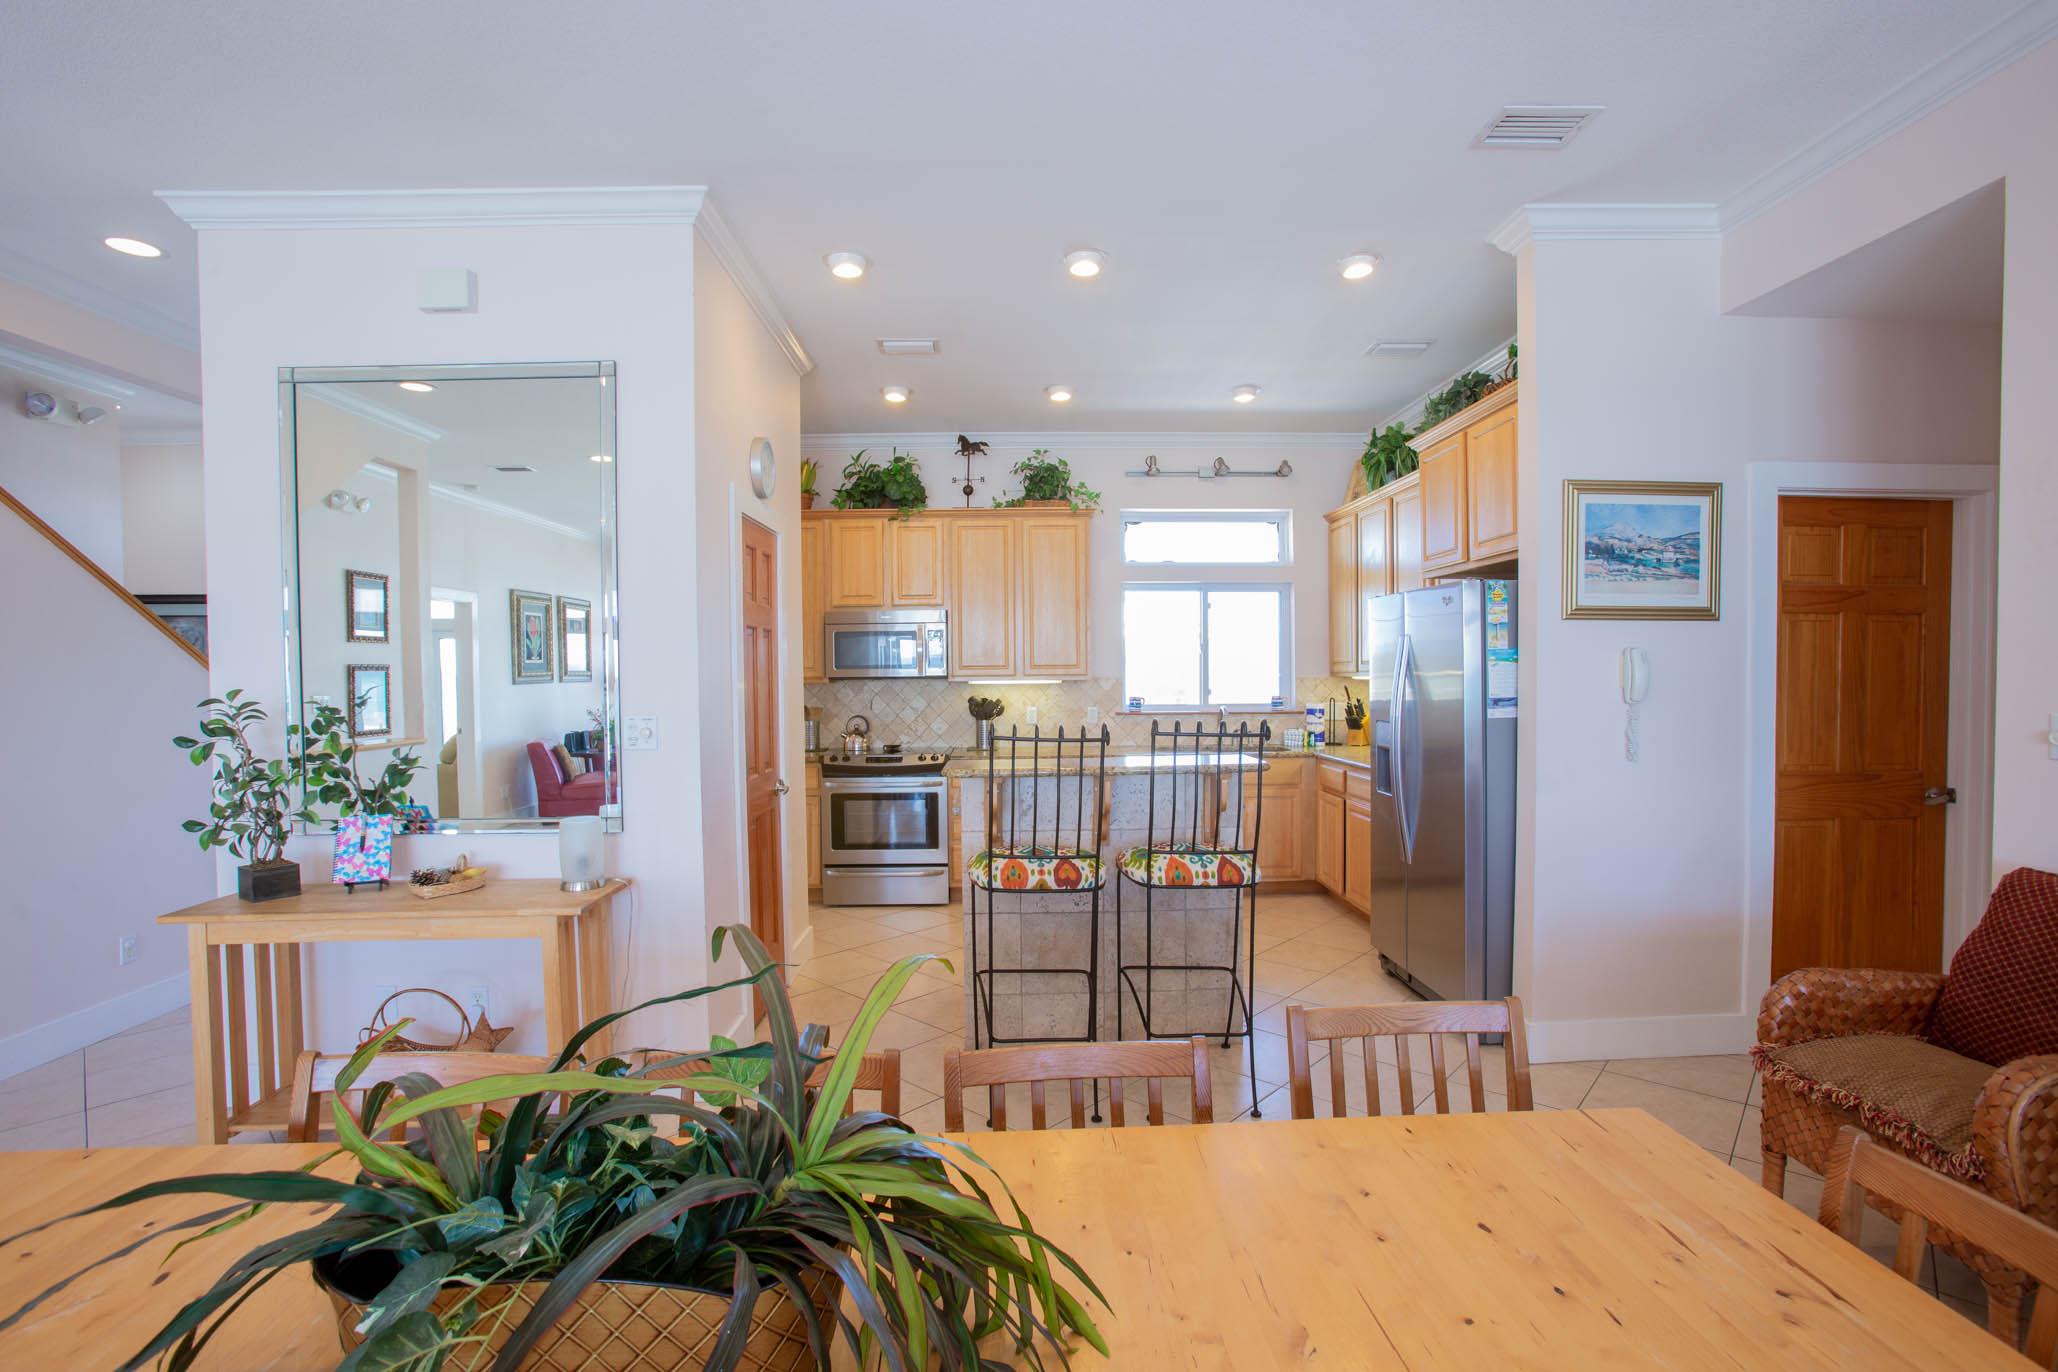 Ariola 1214 House/Cottage rental in Luxury Homes in Pensacola Beach Florida - #15